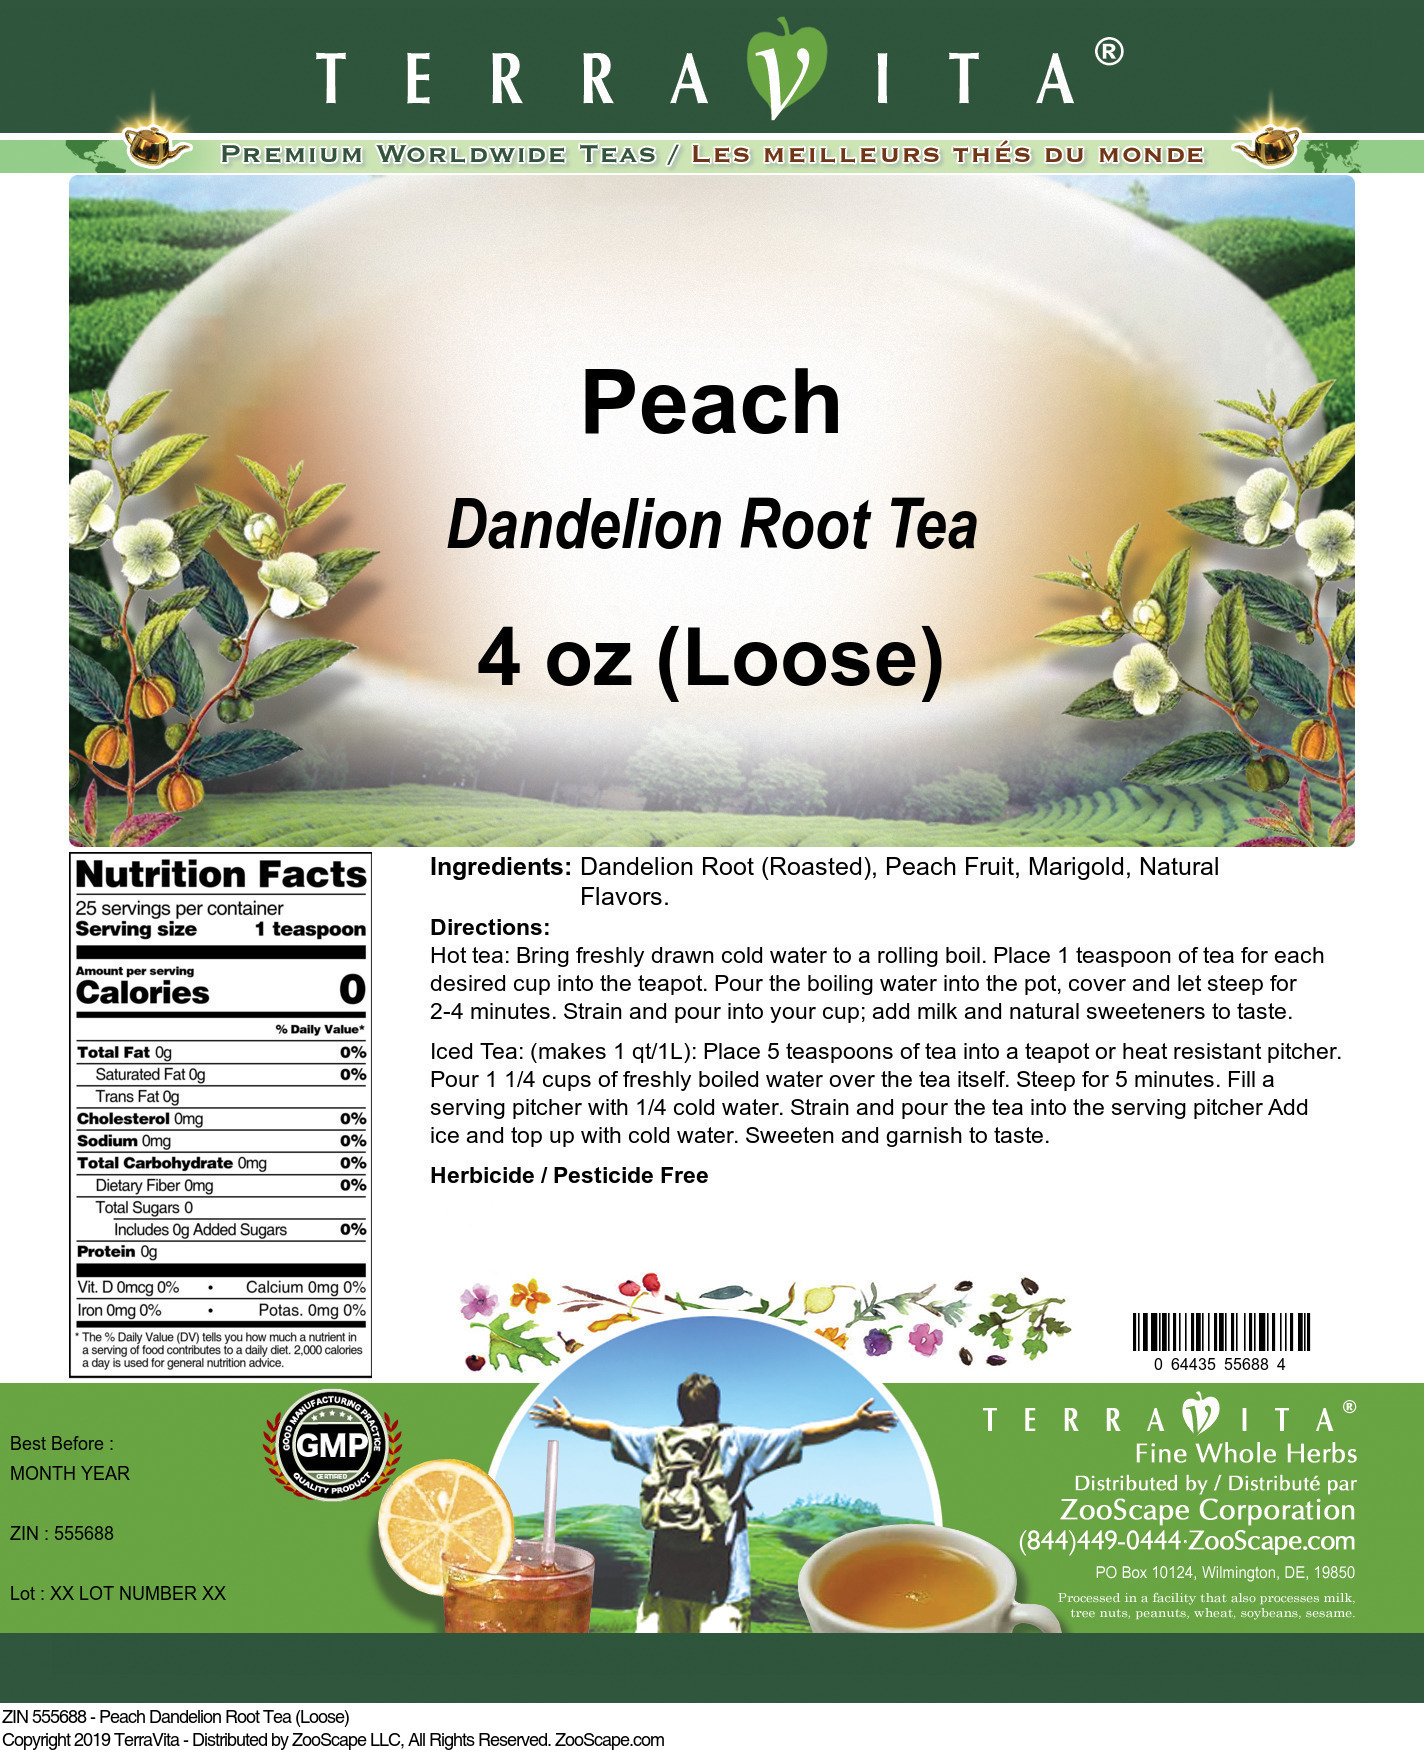 Peach Dandelion Root Tea (Loose)